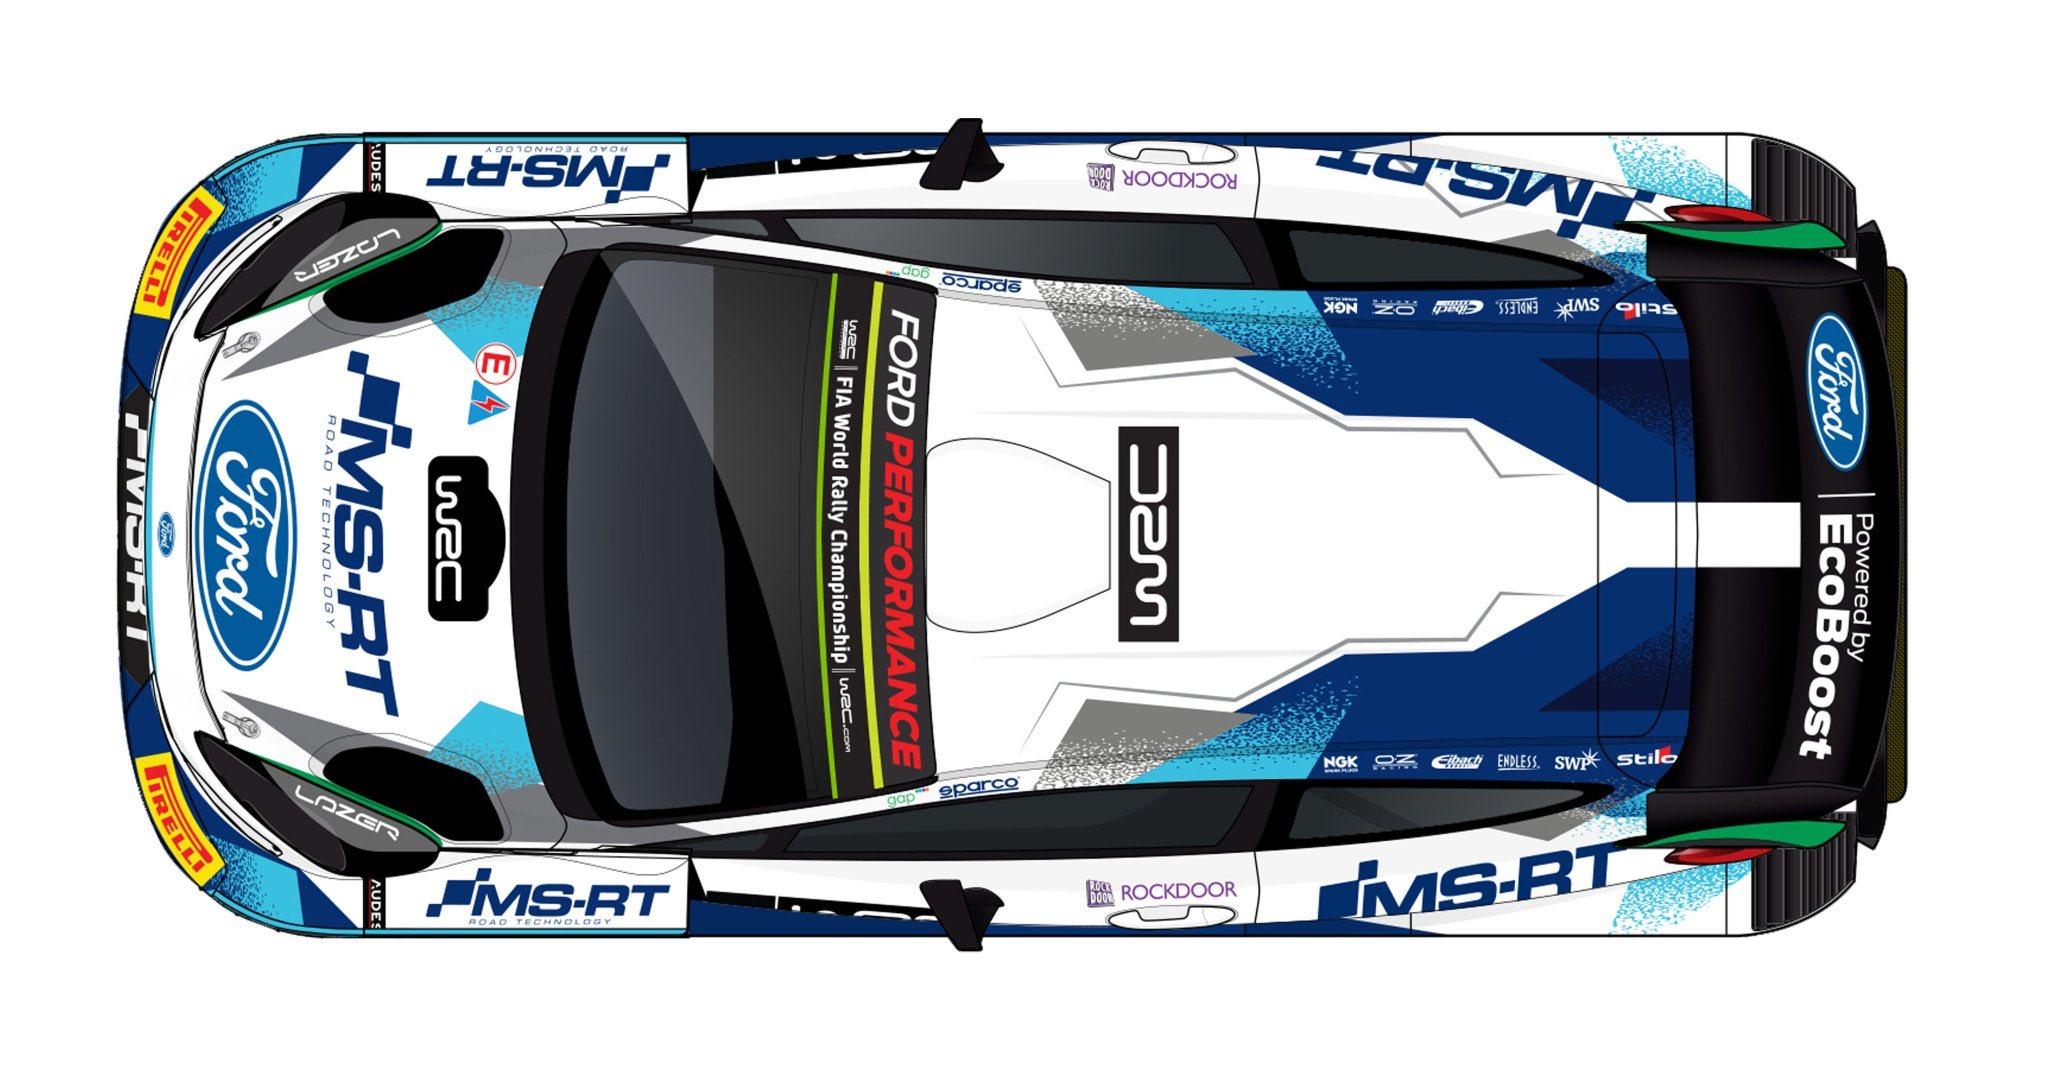 World Rally Championship: Temporada 2021  - Página 2 ErC_E7rWMAQrkIV?format=jpg&name=large